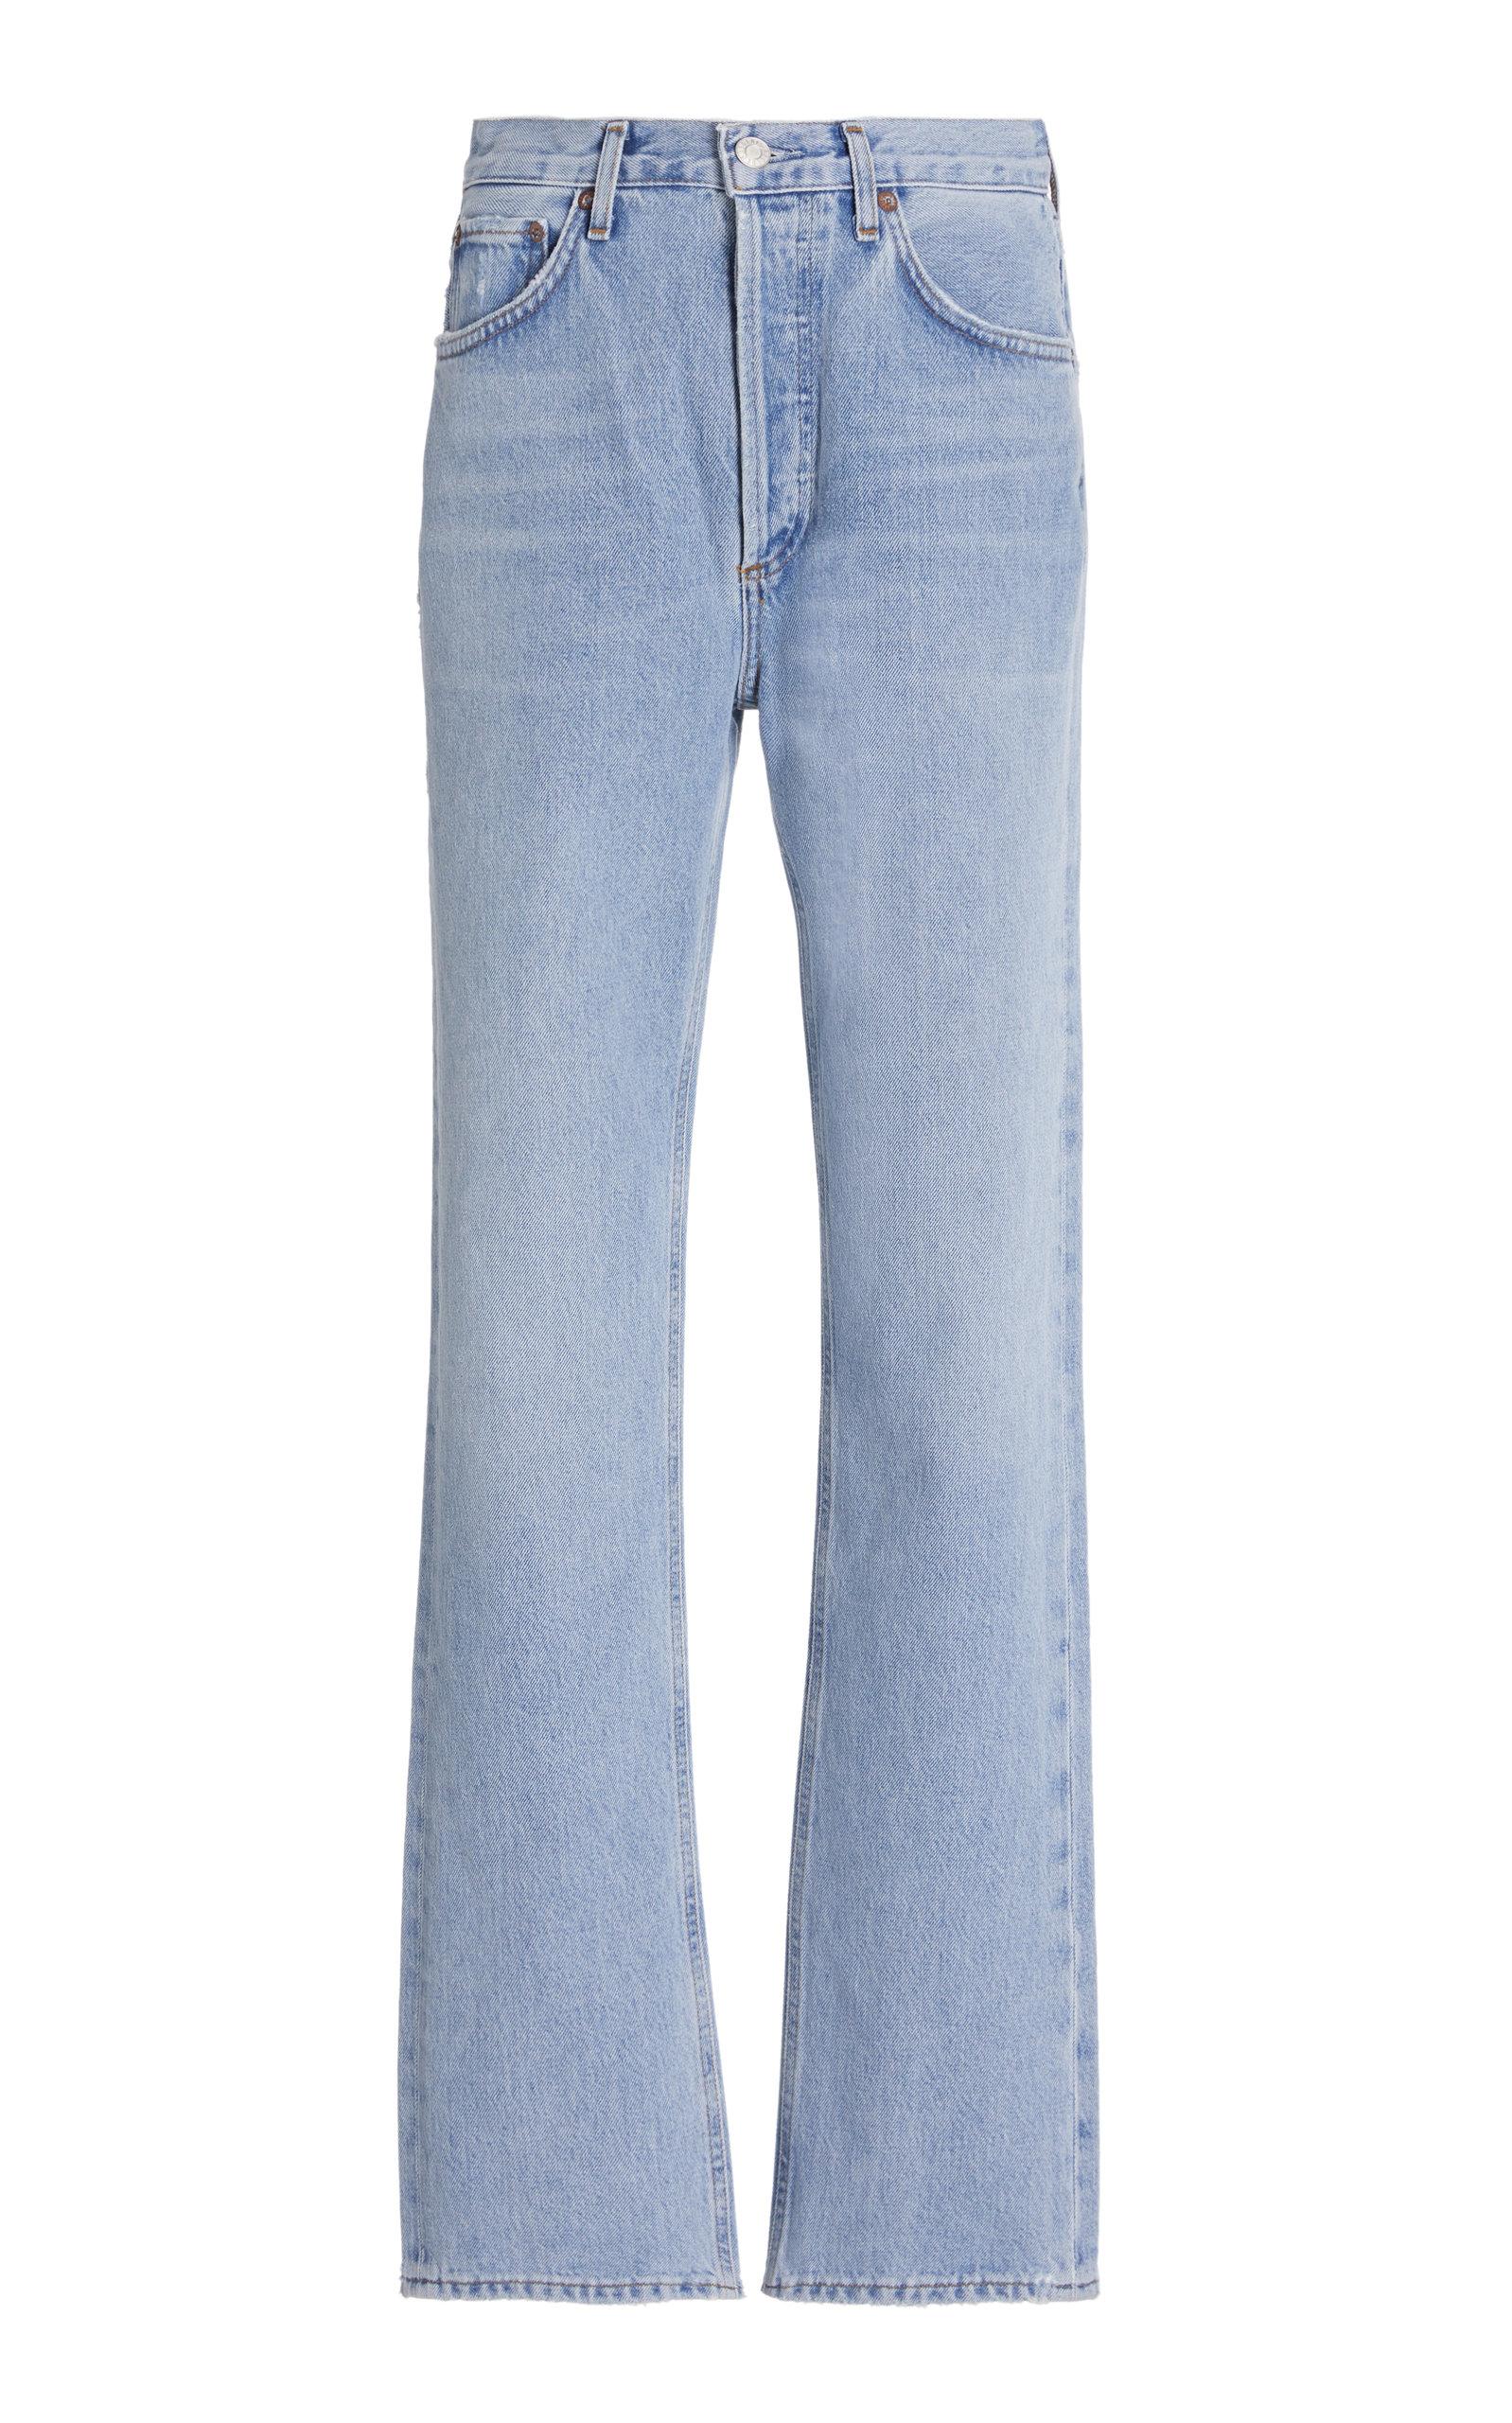 Agolde - Women's Lana Rigid Mid-Rise Straight Leg Jeans  - Light Wash - Moda Operandi